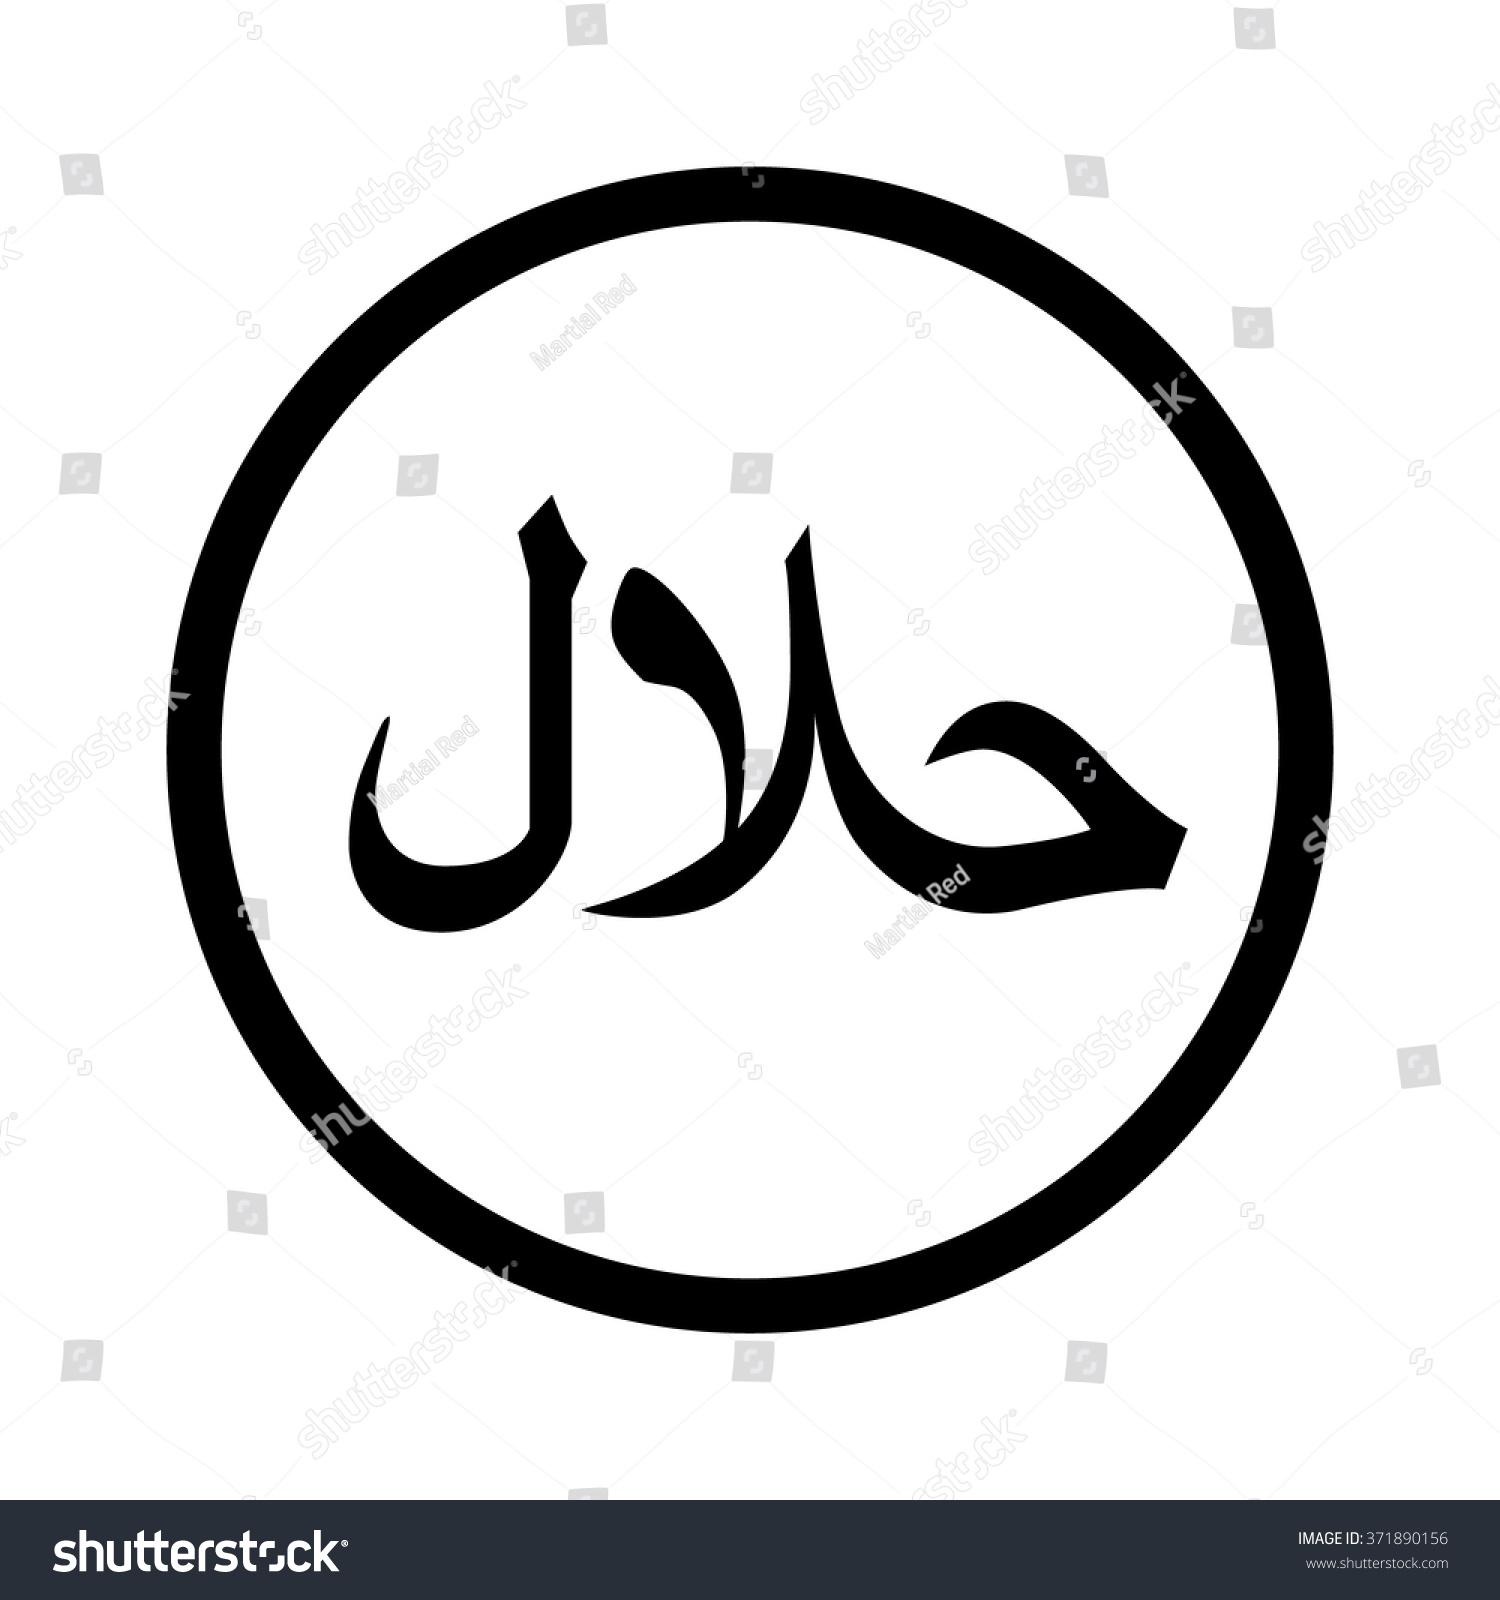 Halal food product dietary label apps stock vector 371890156 halal food product dietary label for apps and websites buycottarizona